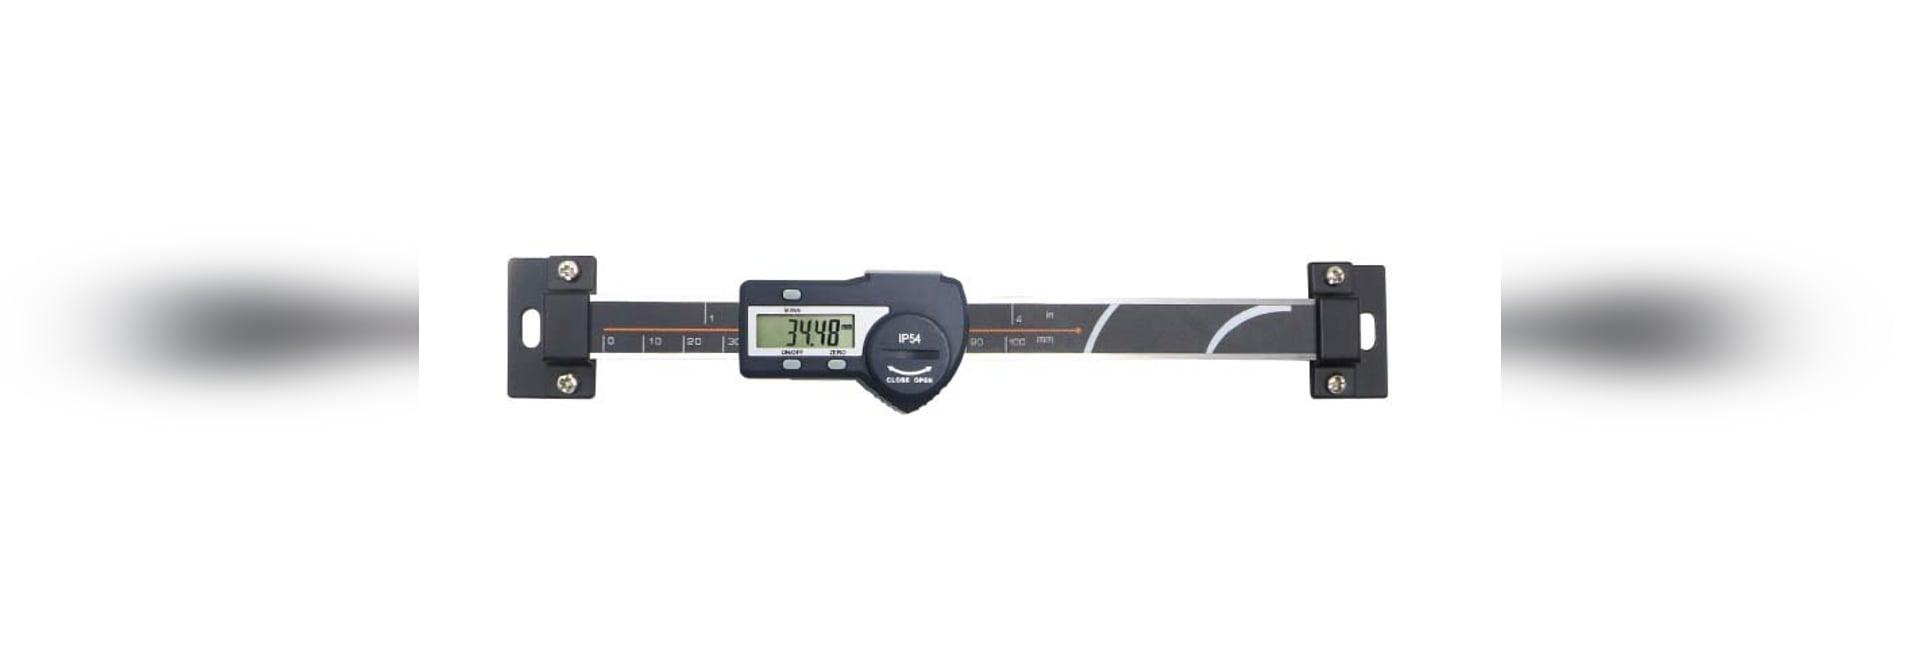 SHAHE/5402-100 0-100mm 0.01mm ±0.02mm/Digital Linear Scale